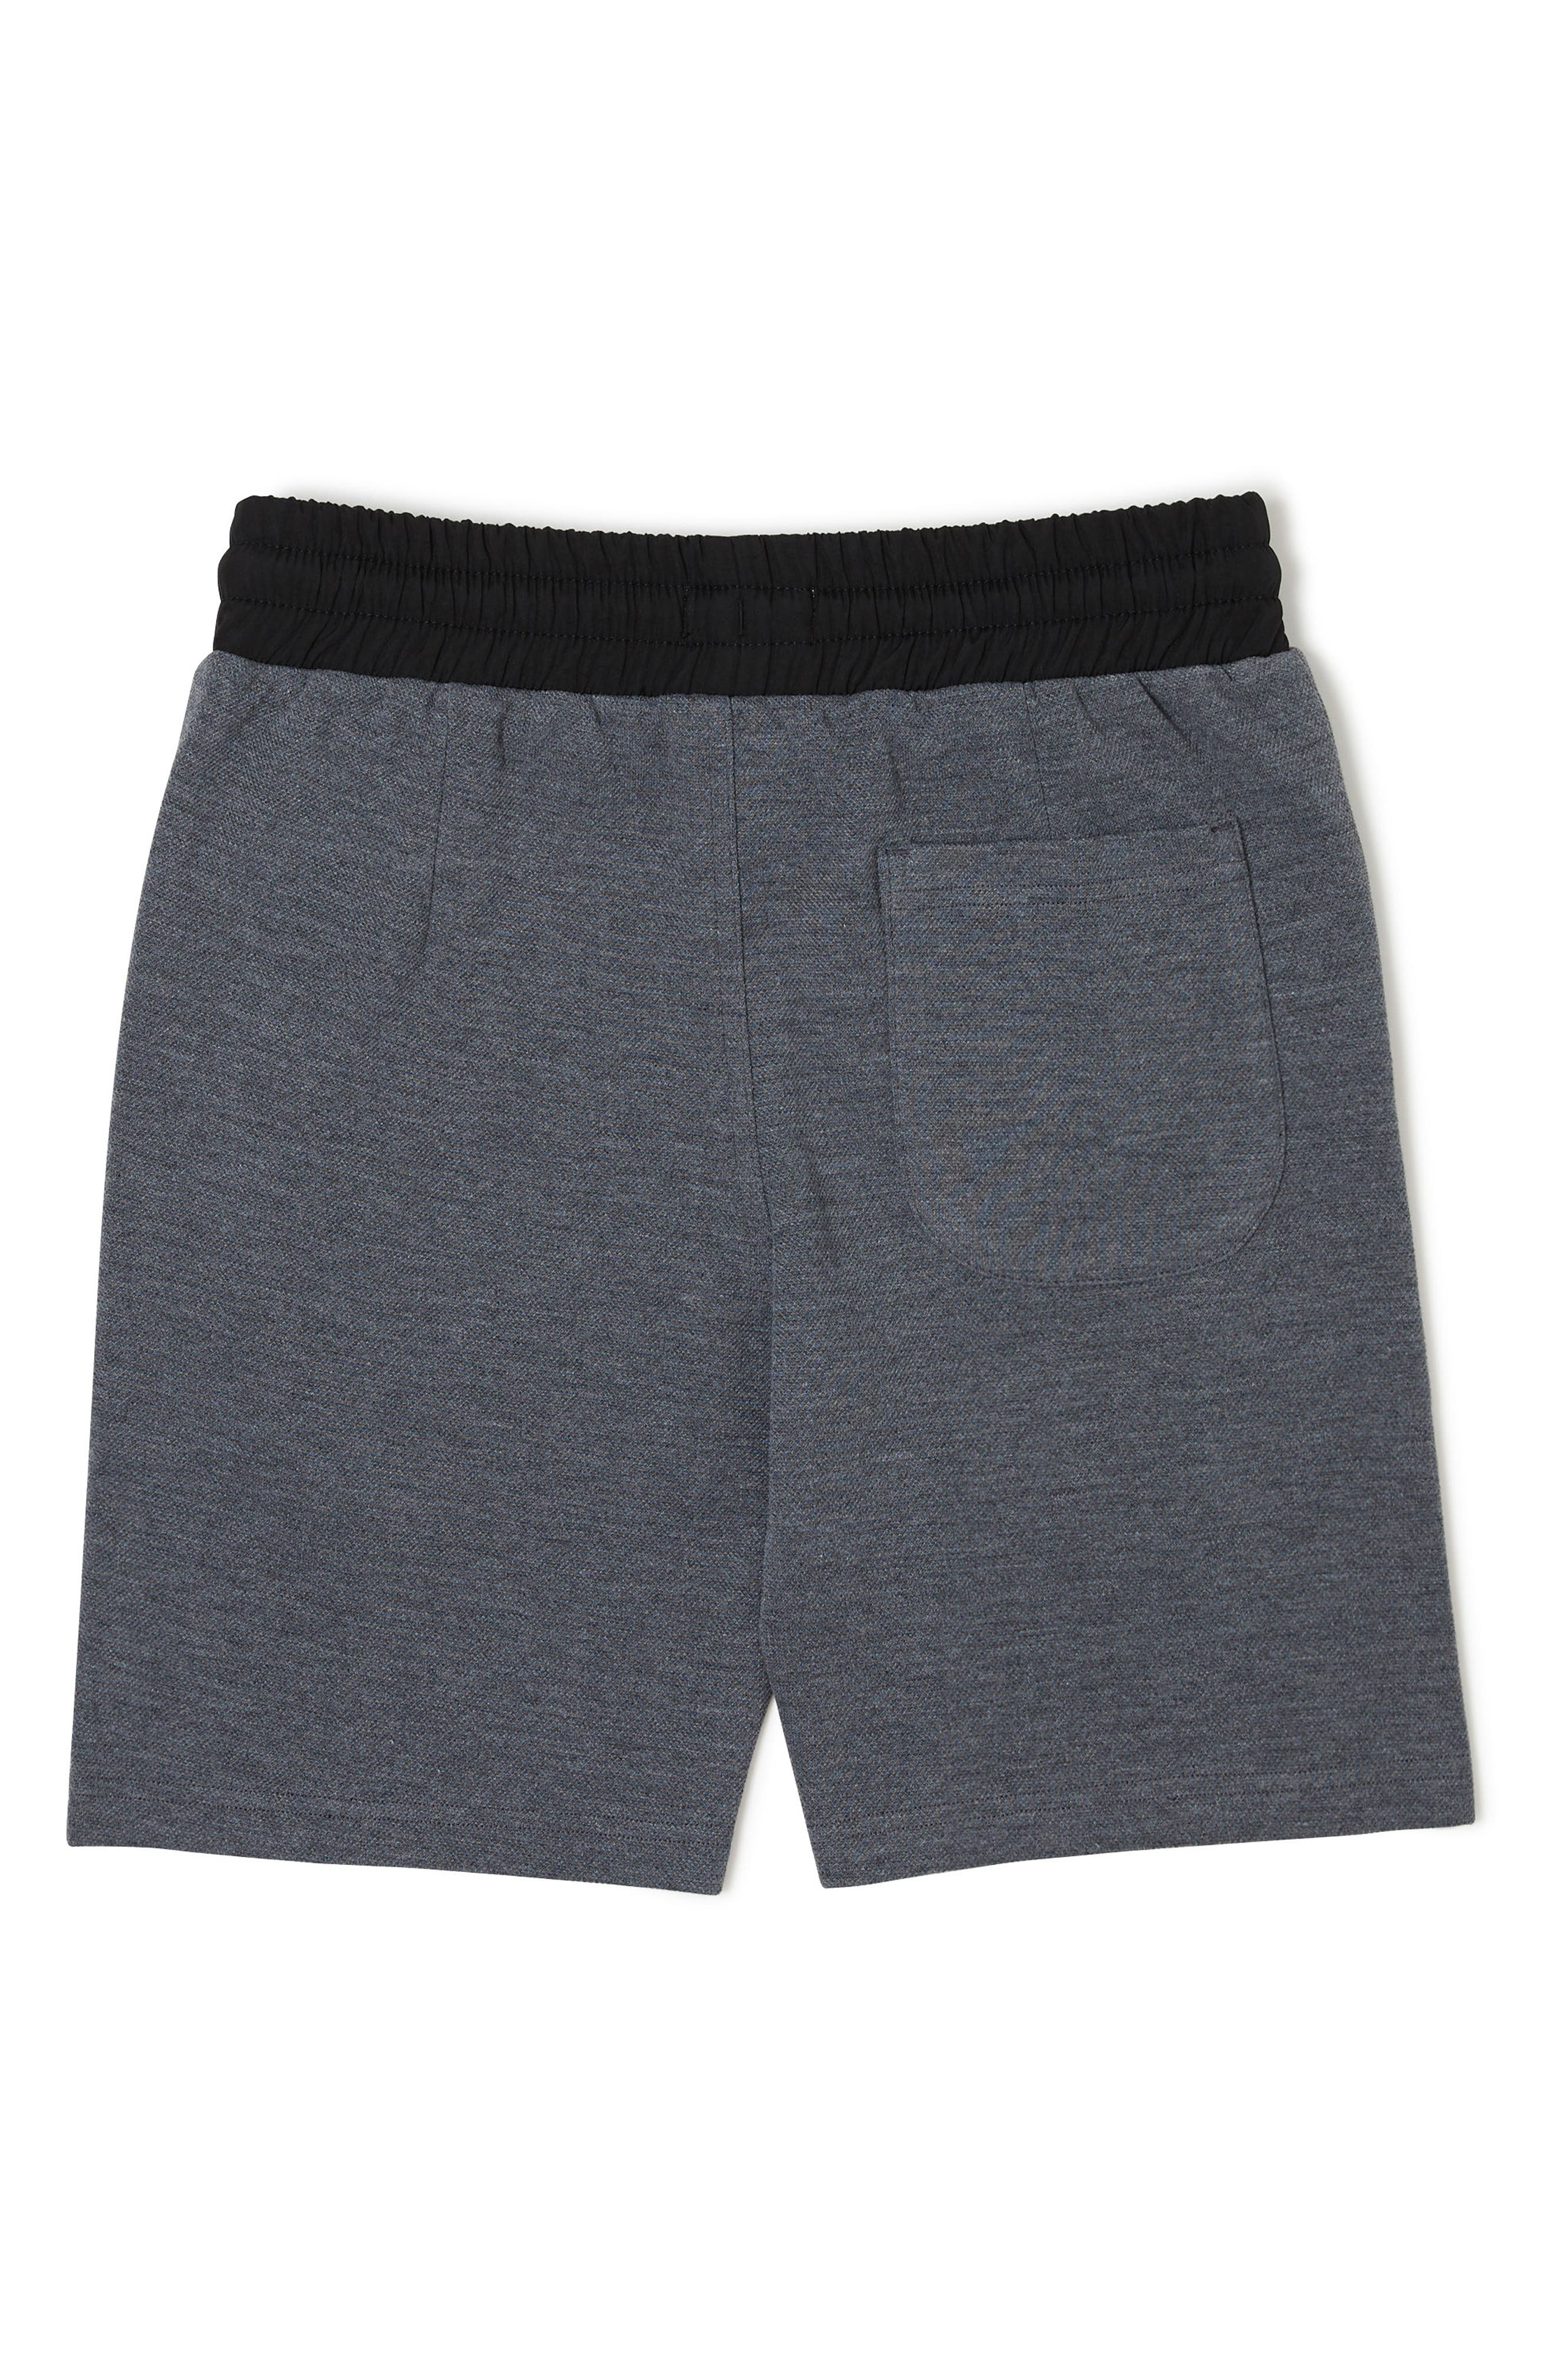 Liam Knit Shorts,                             Alternate thumbnail 2, color,                             HEATHER GREY